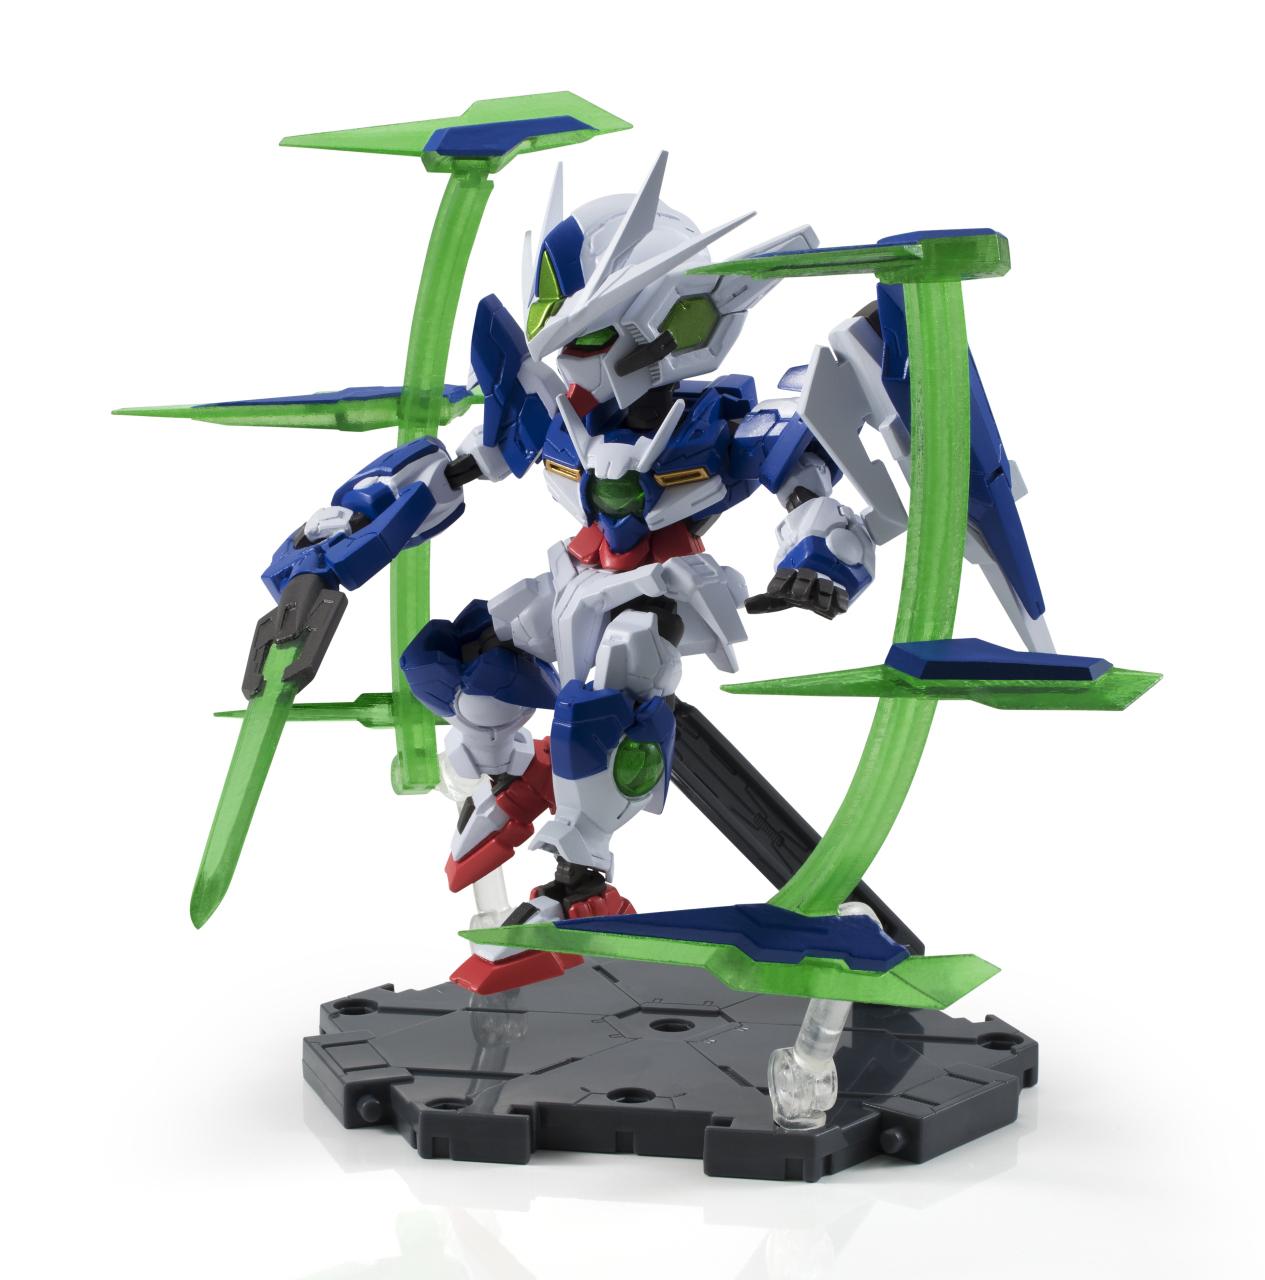 Qan Interesting Link To Display Lightbox With Perfect Fully Bandai Sd Bb 364 Gundam Oo Qant Qanta Quanta Best Action Figure Ms